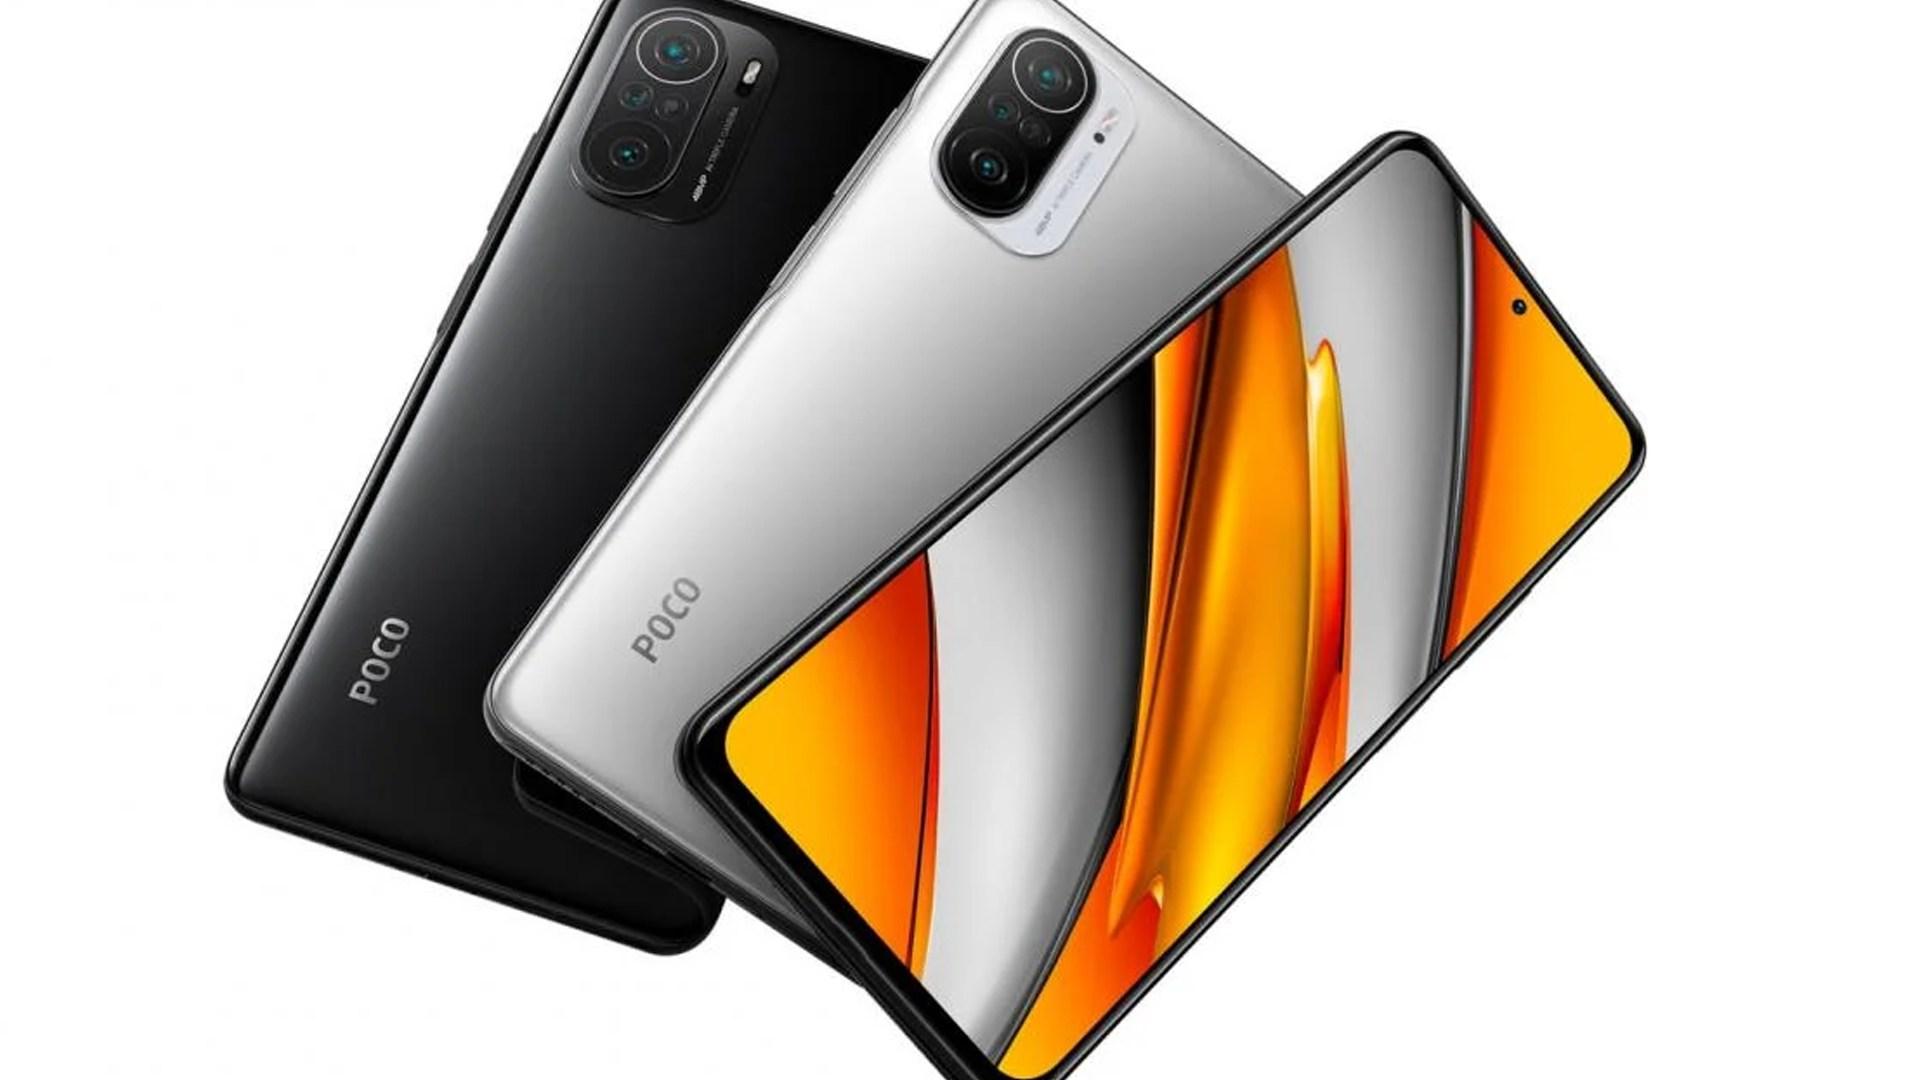 Smartphone, Xiaomi, Redmi, Xiaomi Redmi, Poco, Poco F3, Xiaomi Redmi K40, Redmi K40